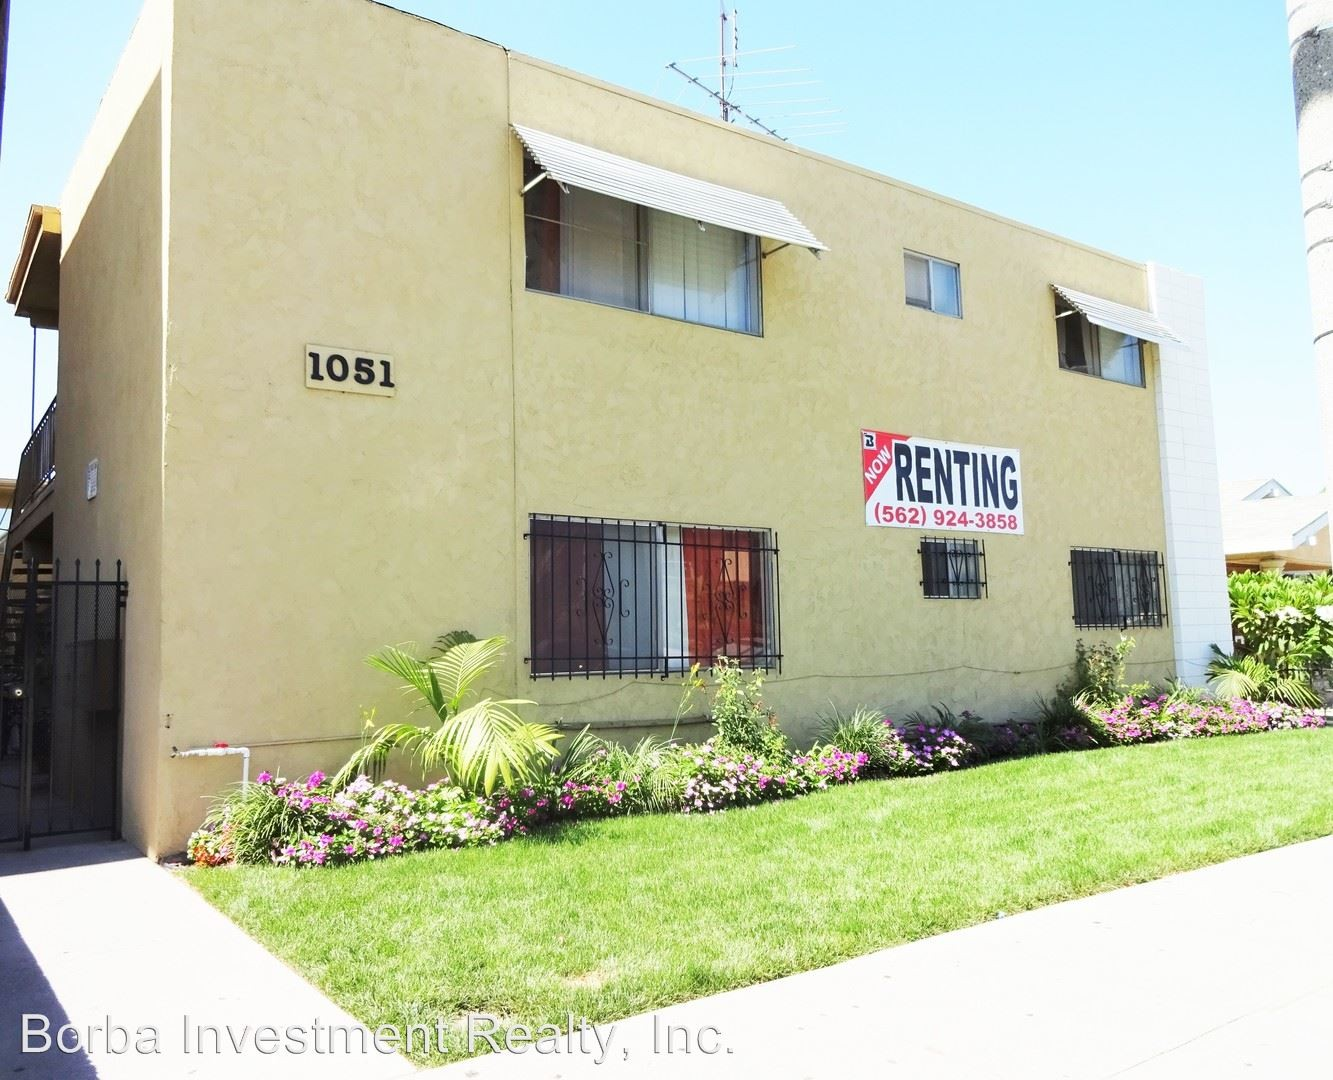 1051 Ohio Ave Long Beach Ca 90804 1 Bedroom Apartment For Rent Padmapper